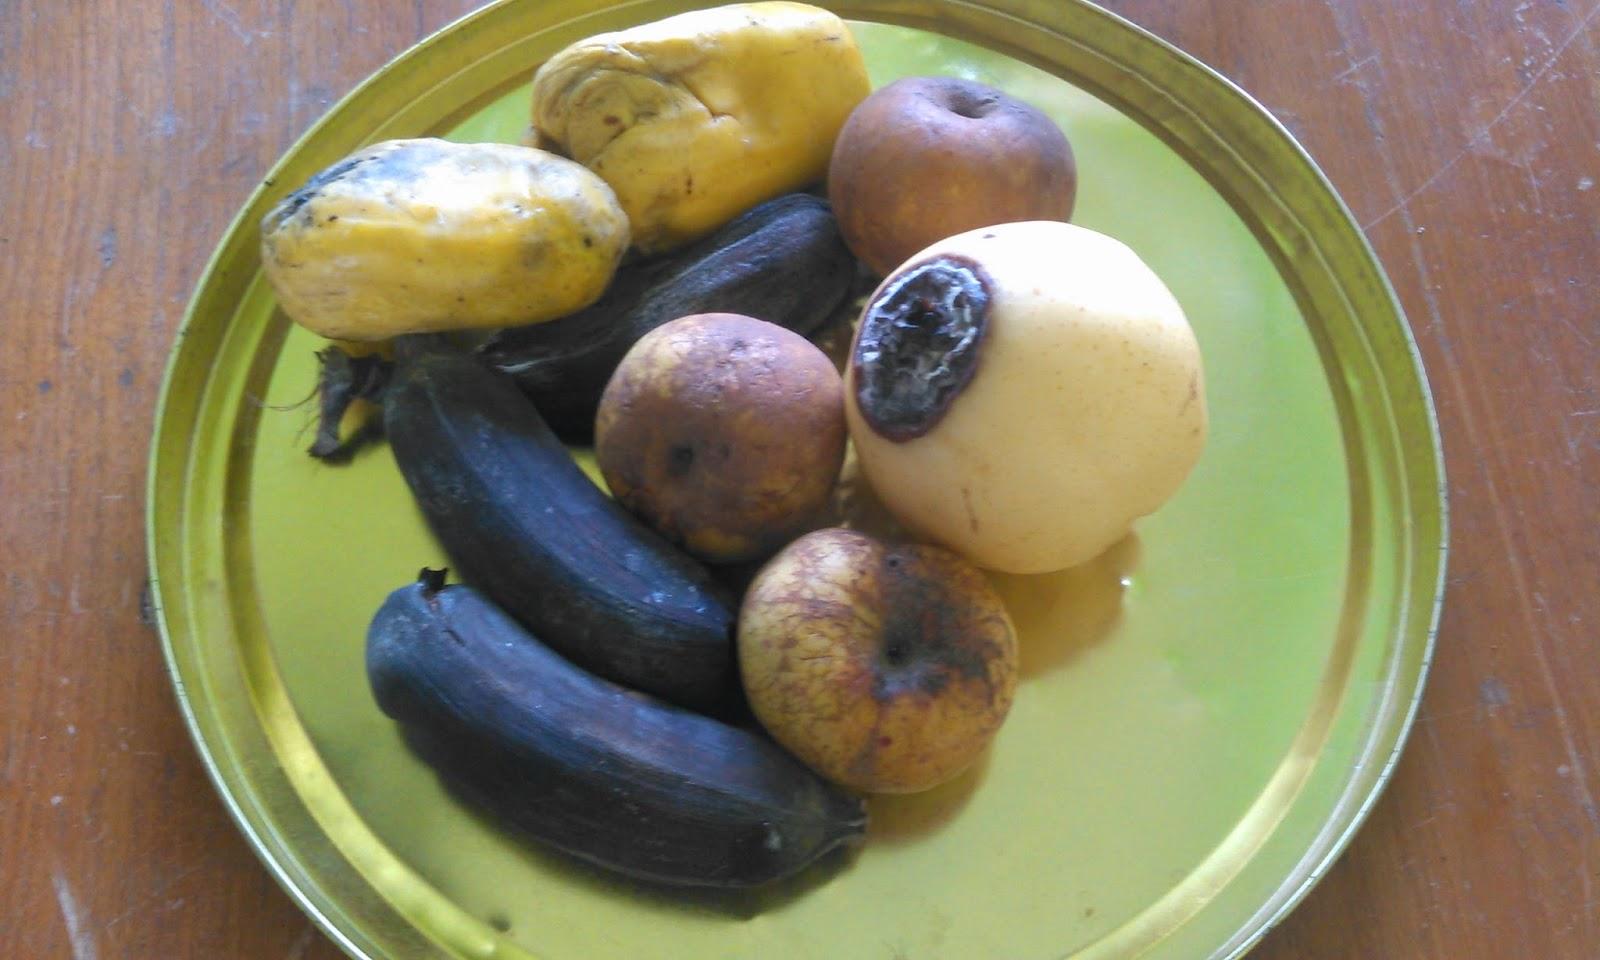 Pemanfaatan Buah-buahan Busuk Sebagai Bahan Pembuat Ragi Cair